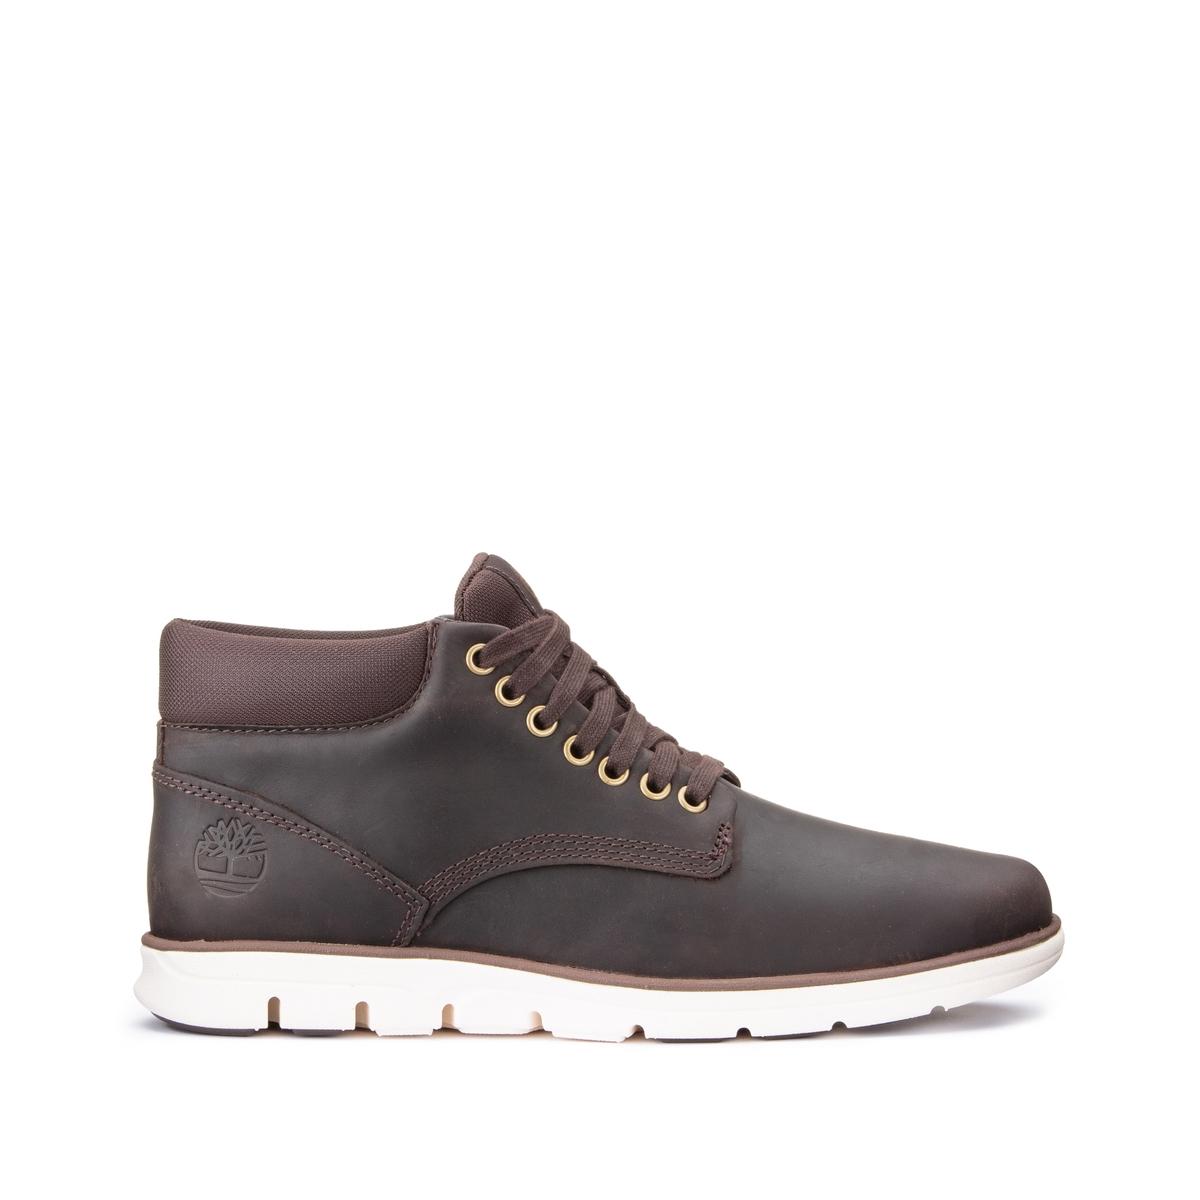 Zapatillas de piel Bradstreet Chukka Leather